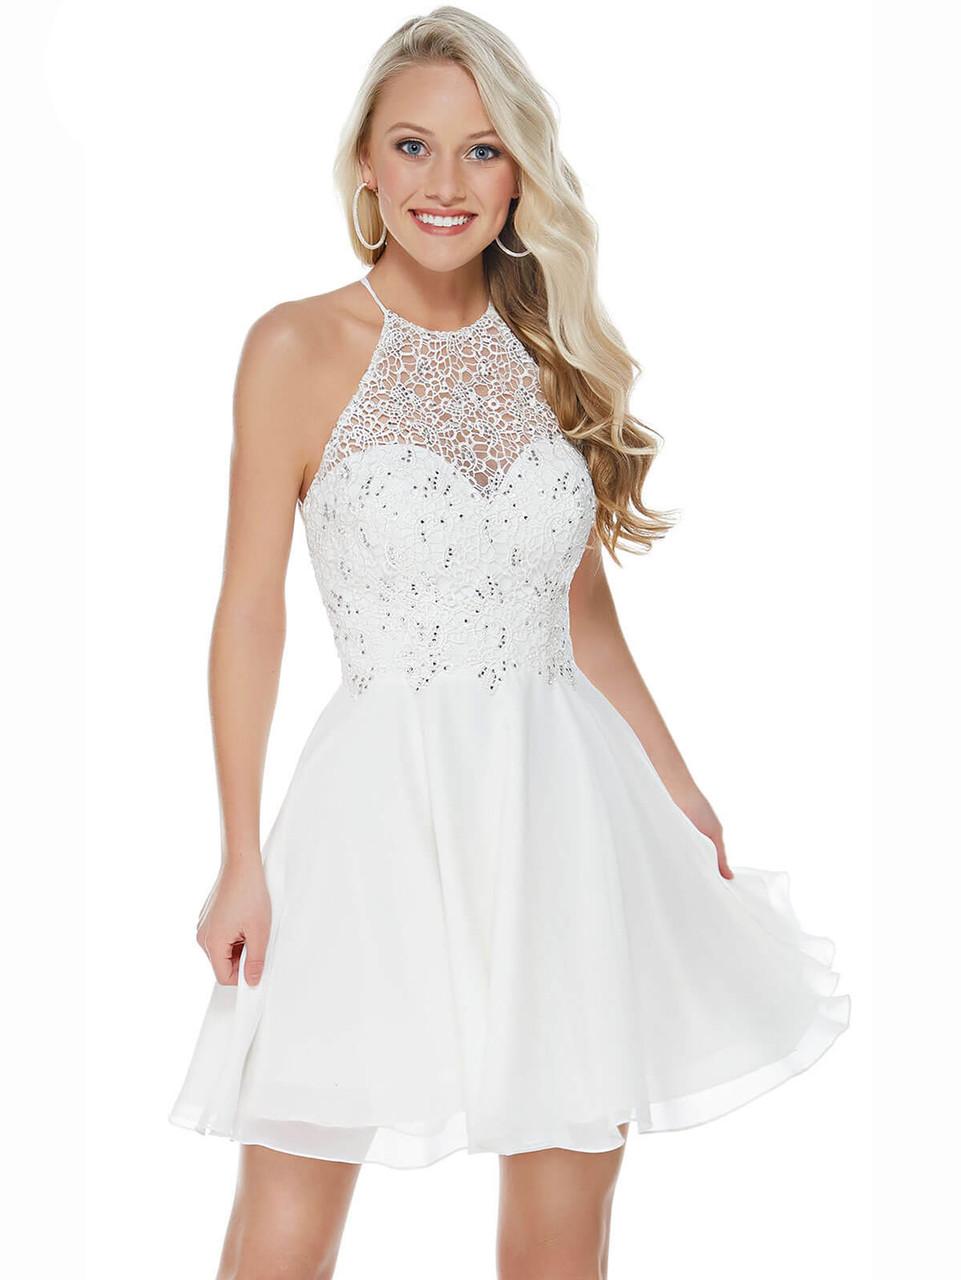 35d55d7ca530 Alyce 3717 Halter A-line Short Dress | PromHeadquarters.com